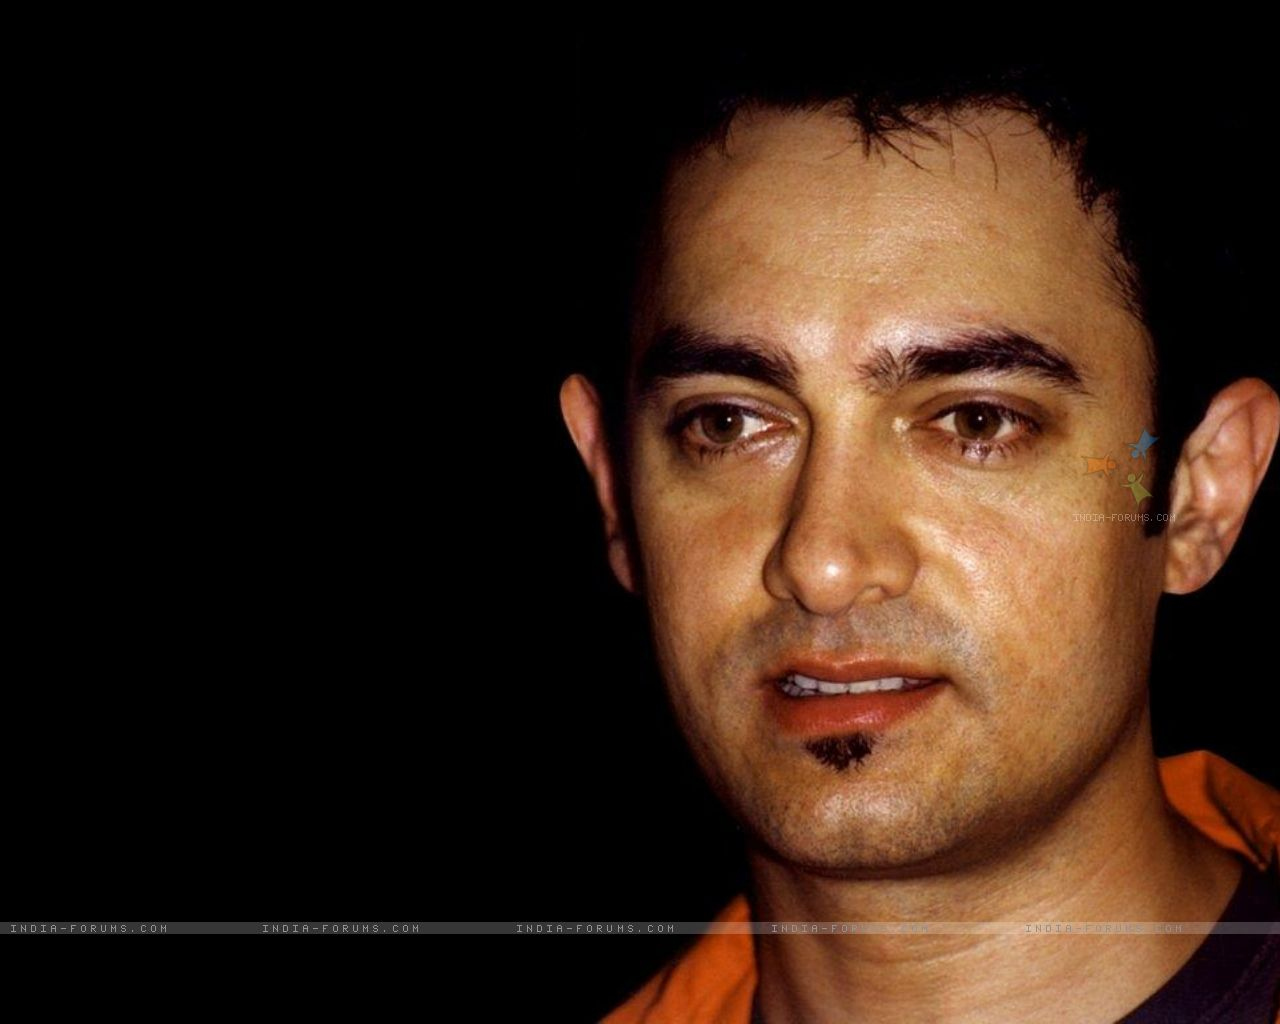 aamir khan Aamir khan, mumbai 15612443 likes 187470 talking about this actor.